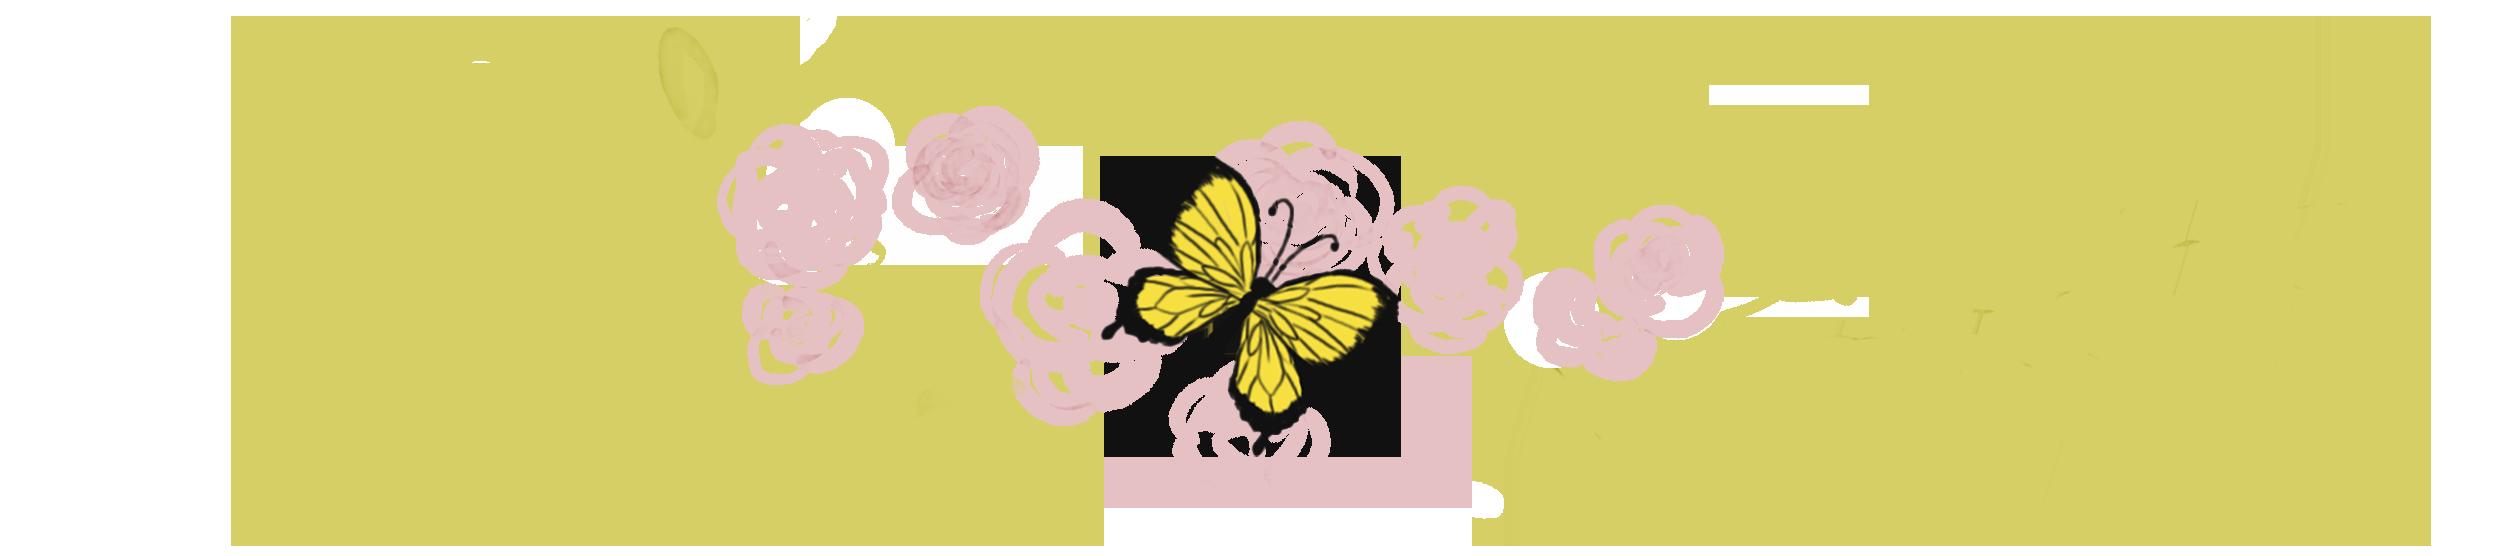 carolinaviroumae-ilustracao-julianarabelo-rodapé